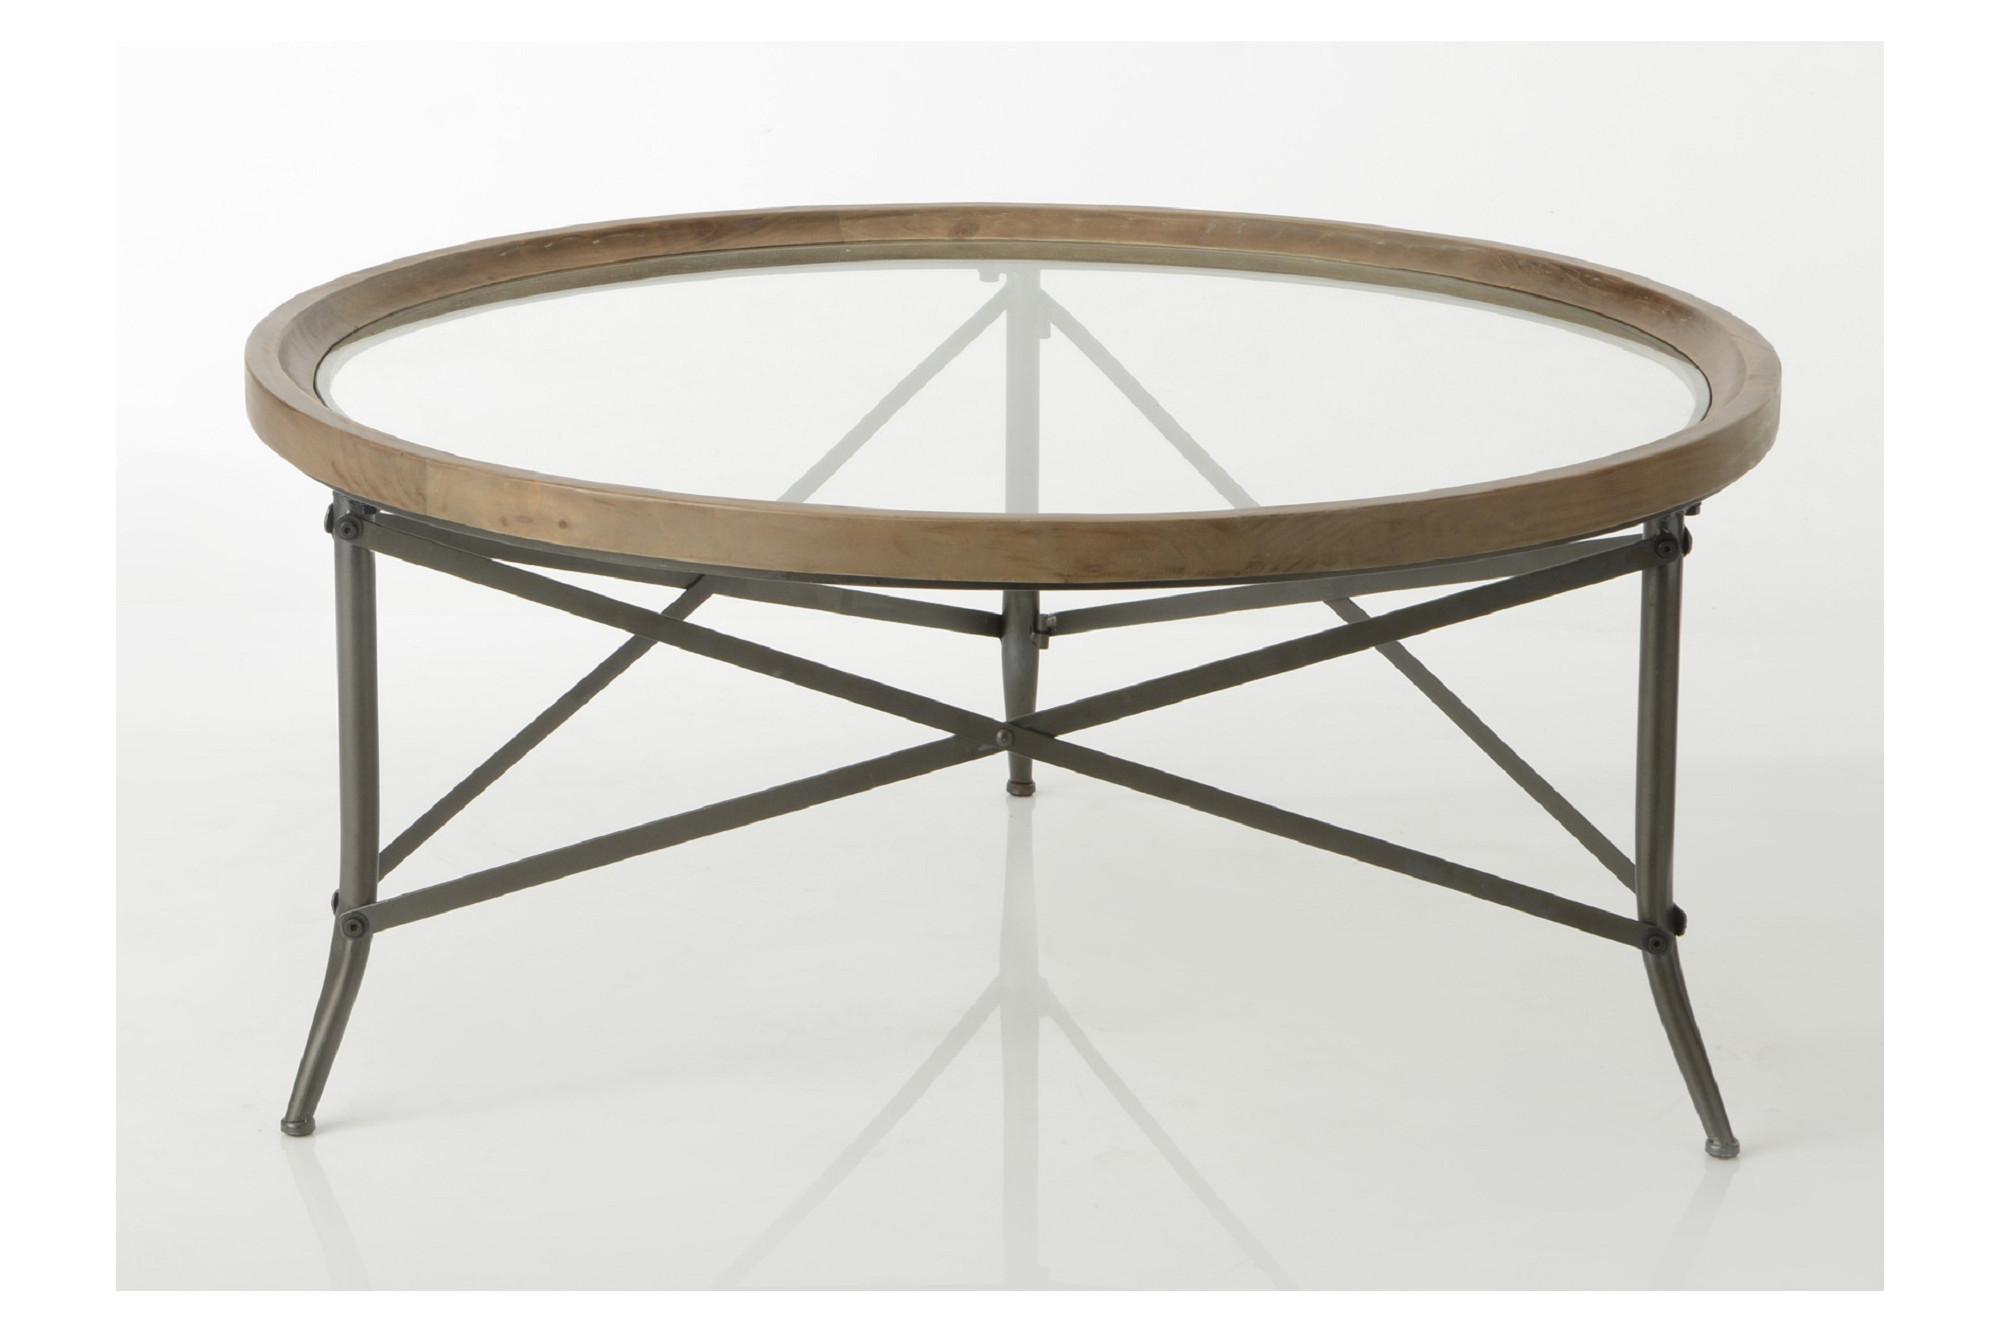 Table Basse Ronde Verre.Table Basse Ronde En Bois Et Pieds Metal Hellin